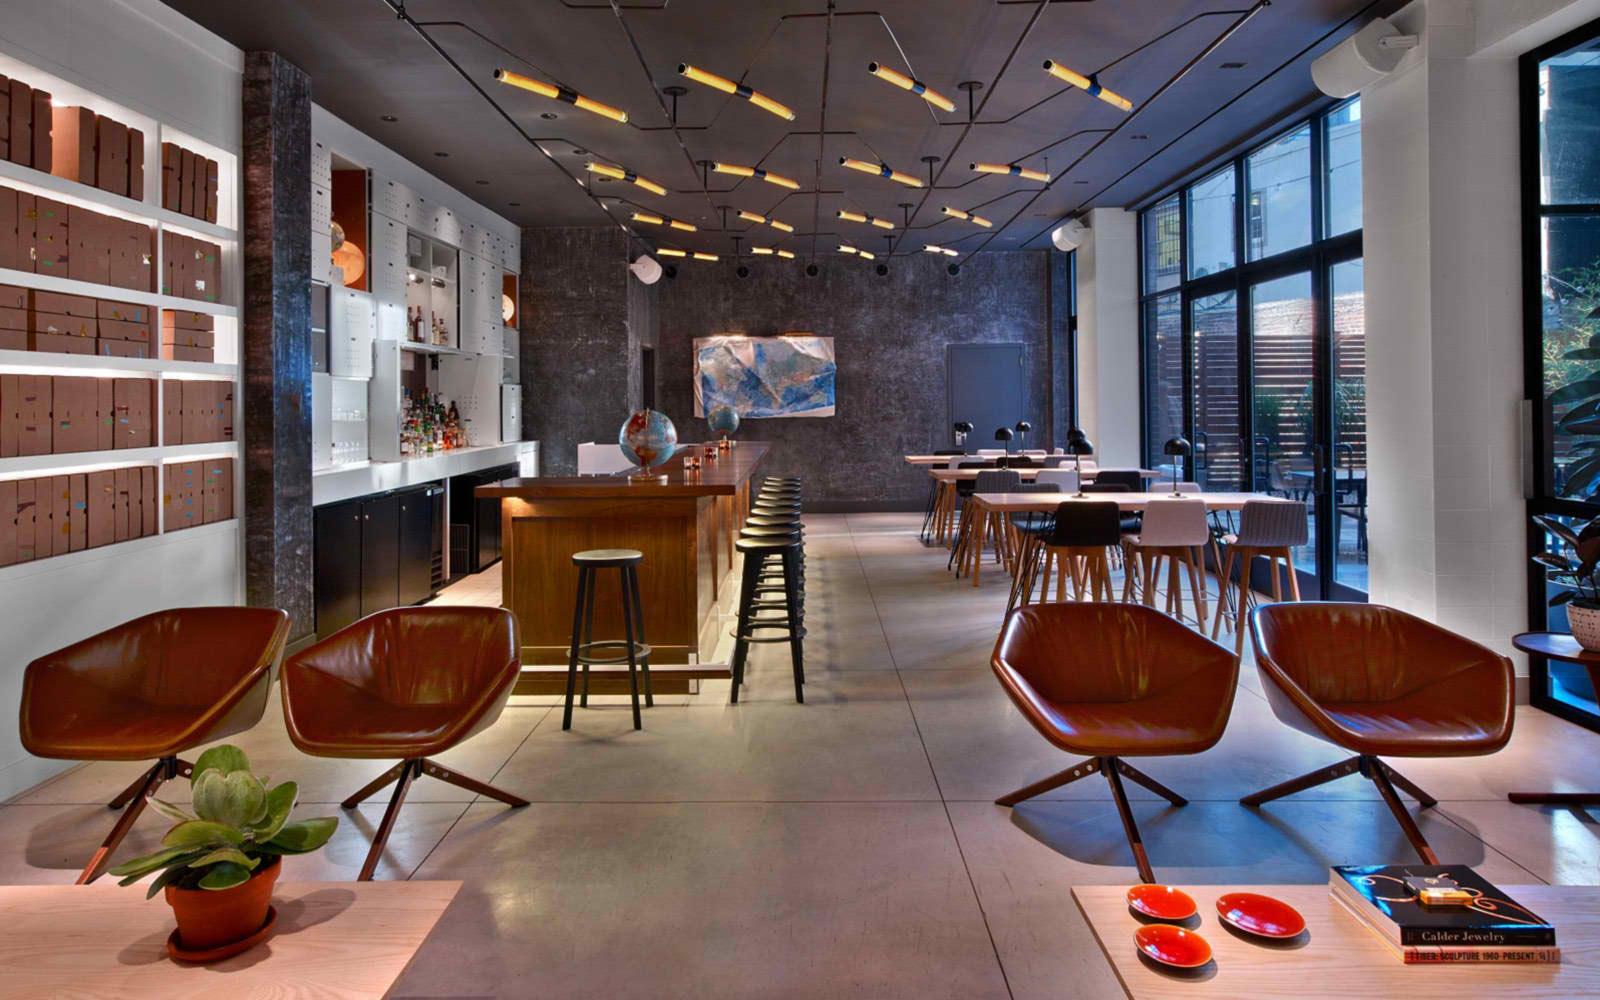 9-arlo-hudson-square-liquor-bar-seating-daytime-1600x1000-2.jpg